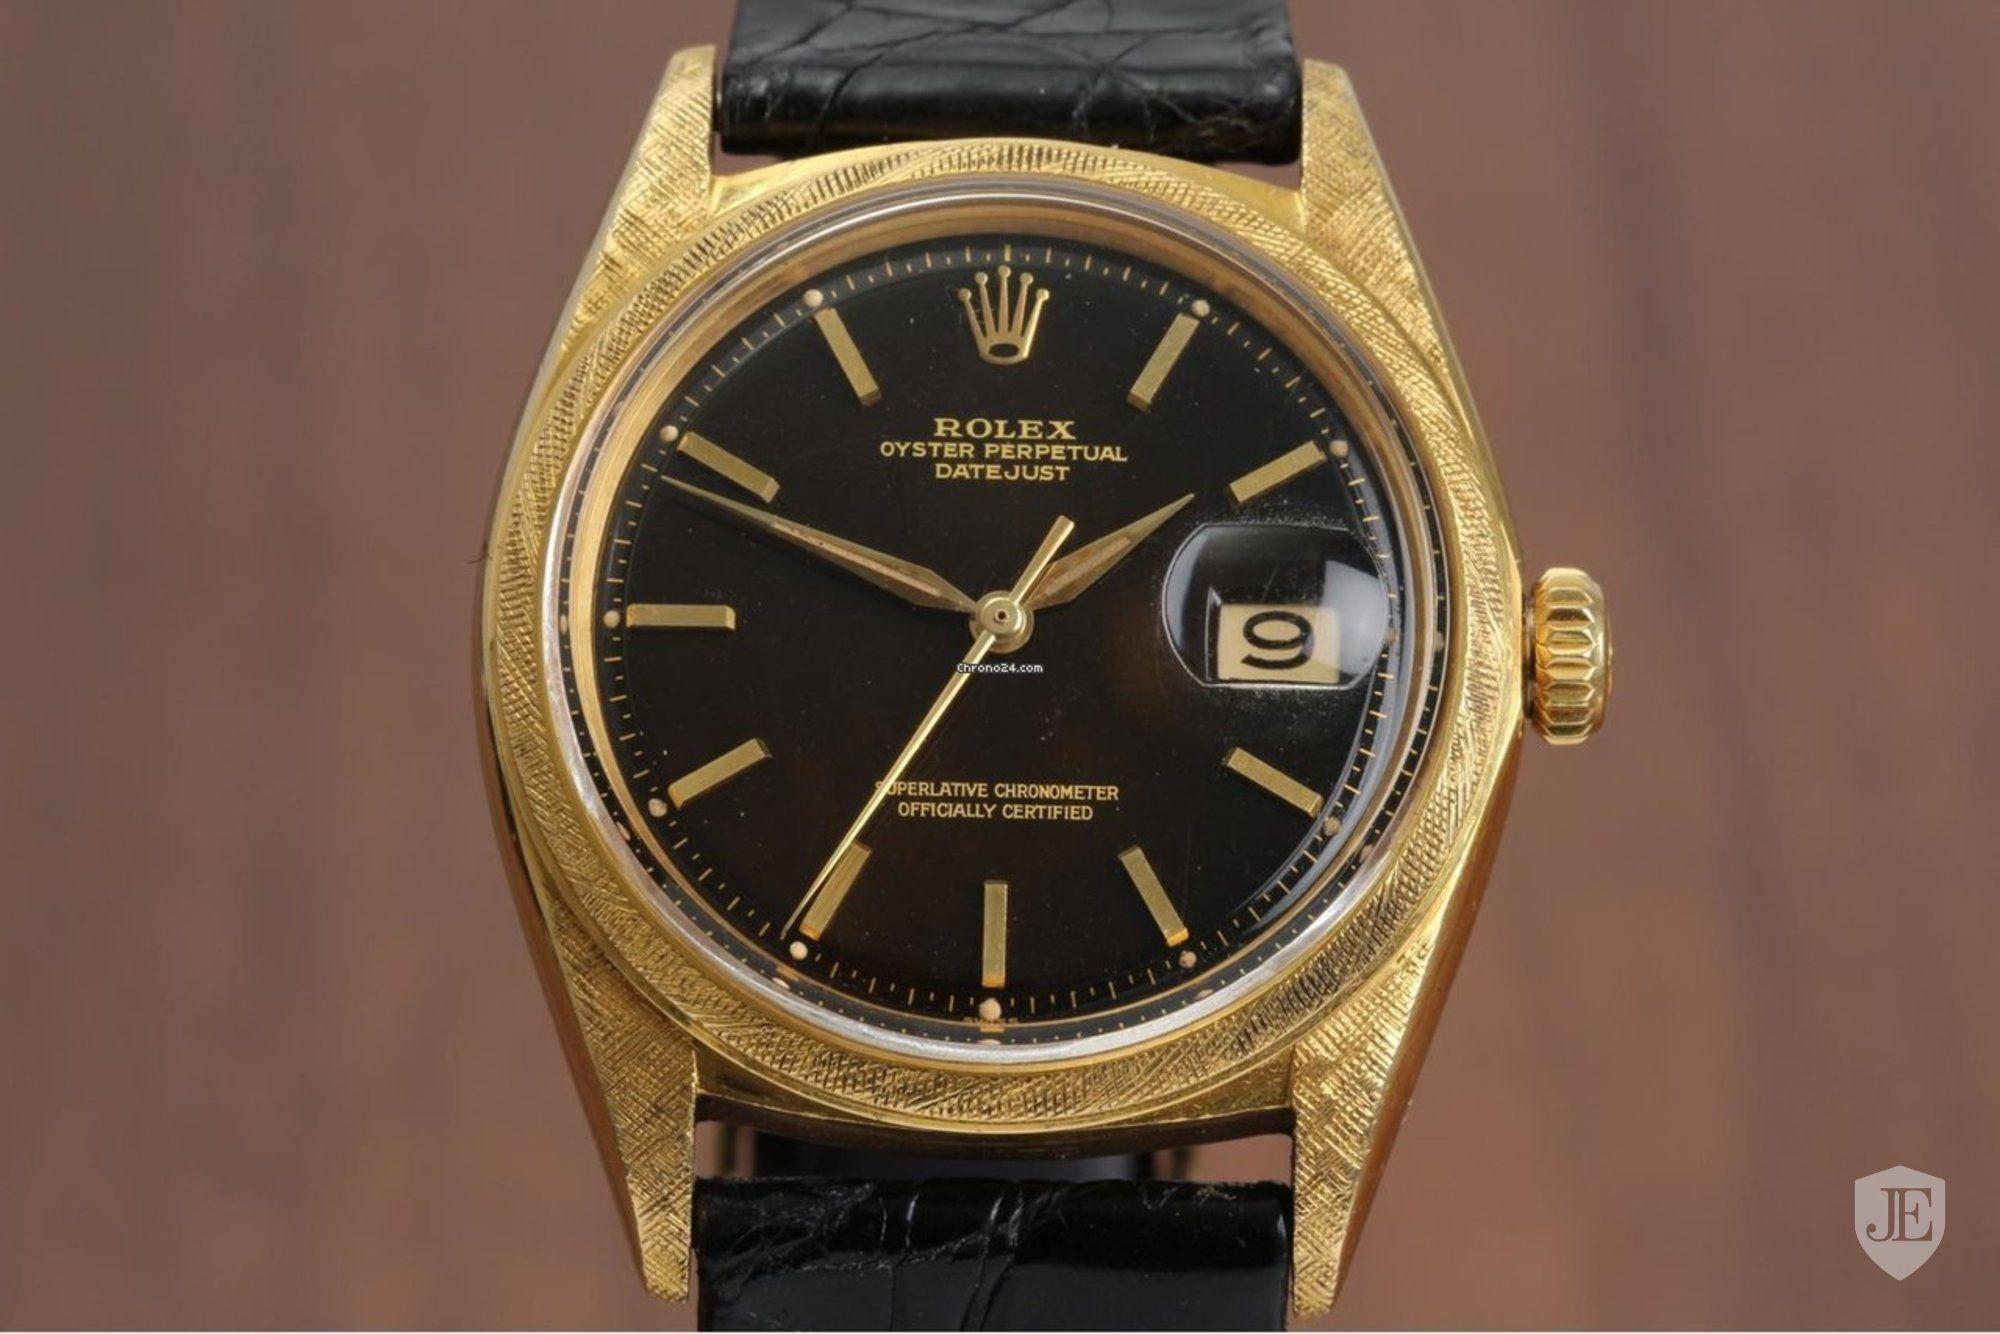 Rolex - 1602 - Datejust